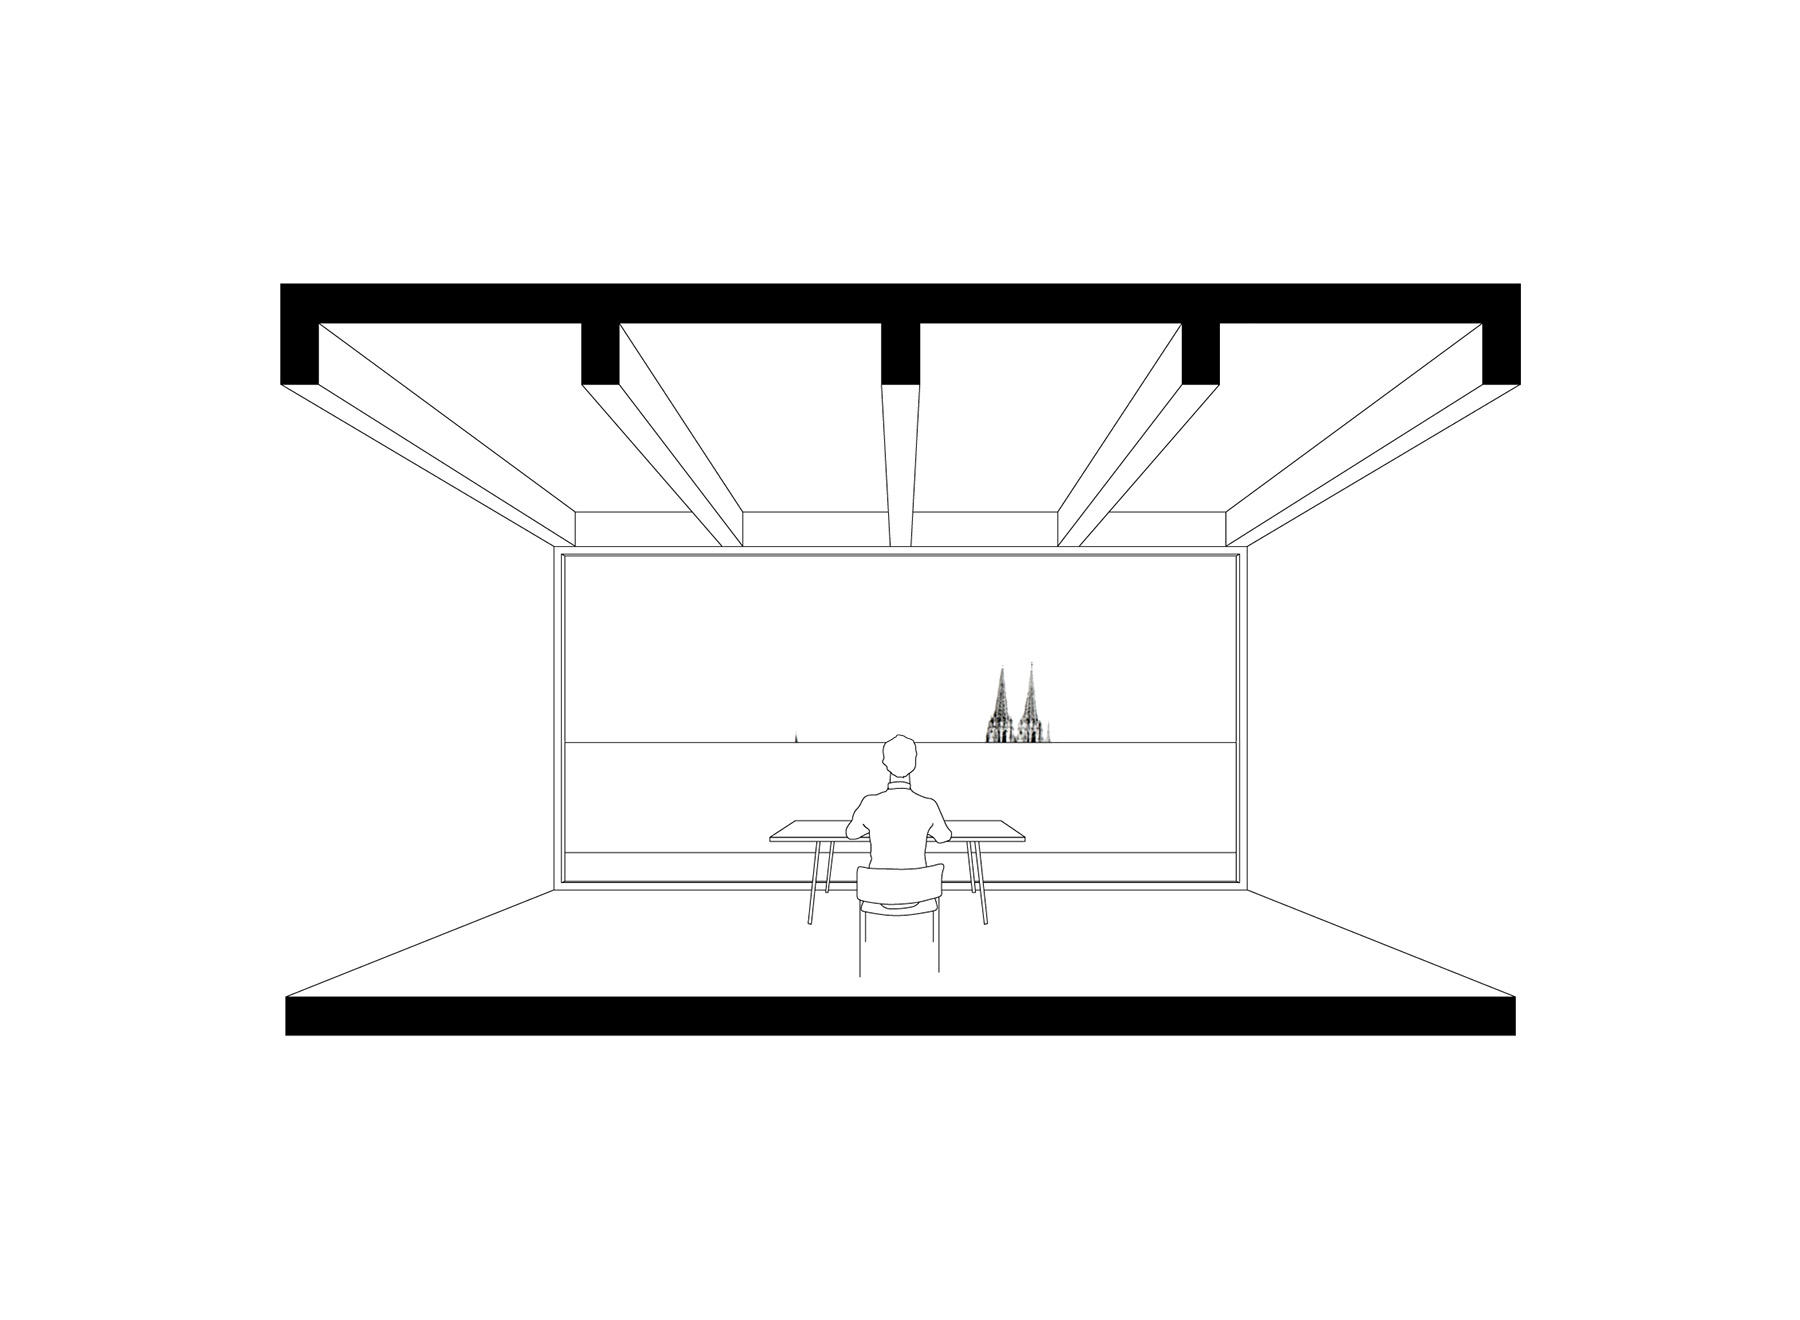 before conversion, balustrade at eye level